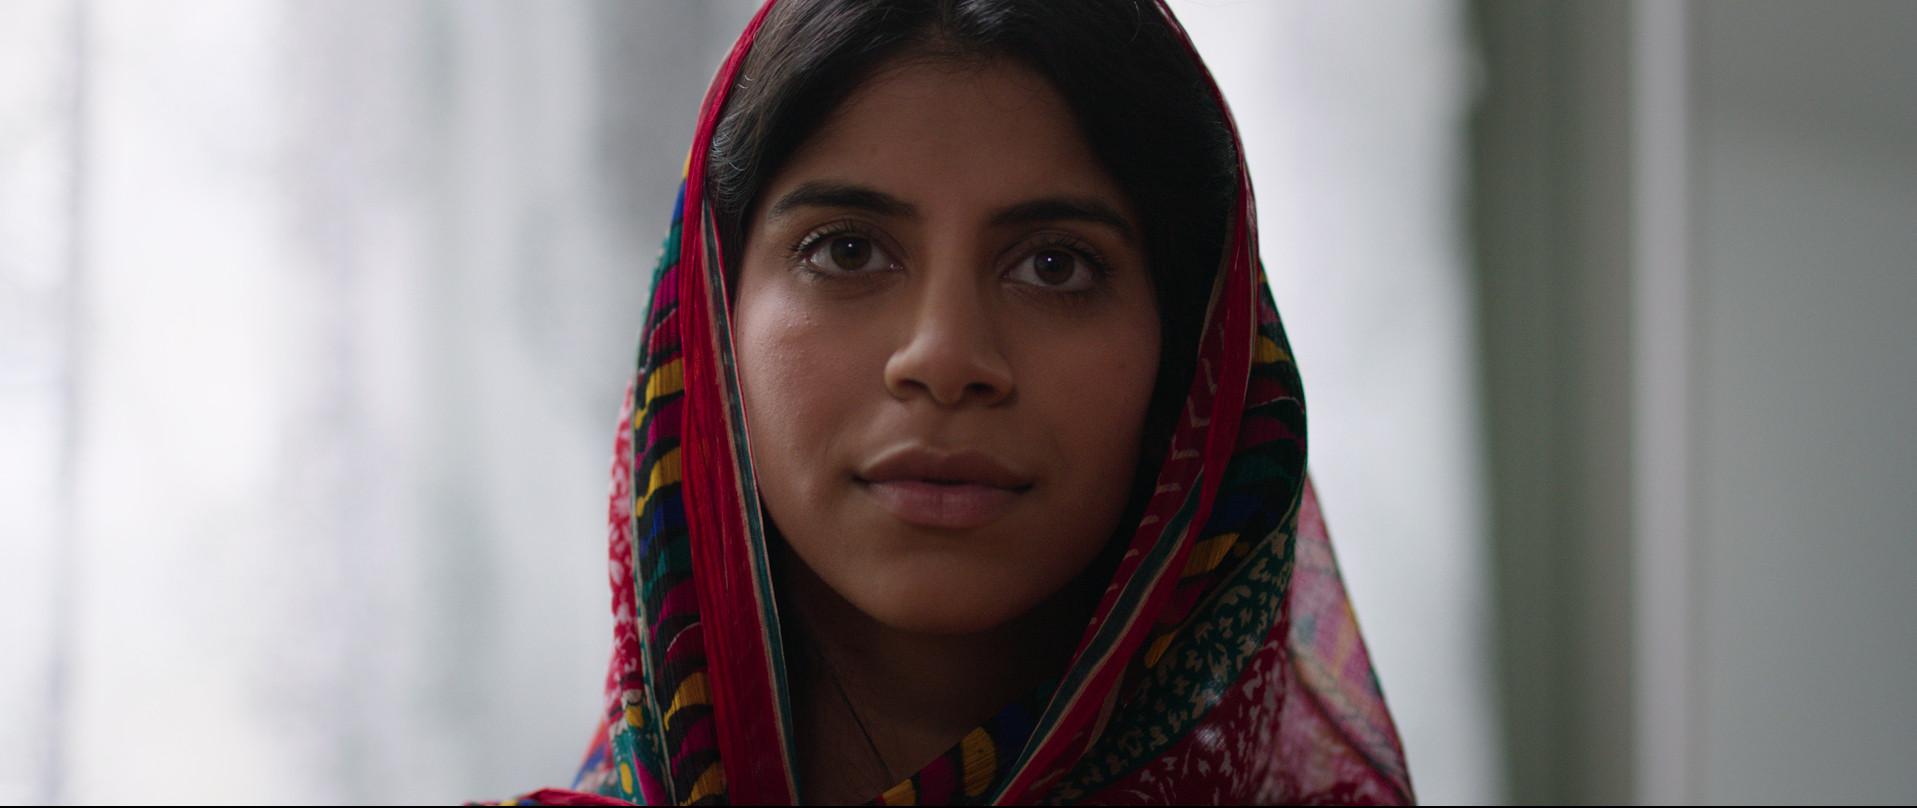 Nikita Tewani as Dua. Identity blends and evolves.